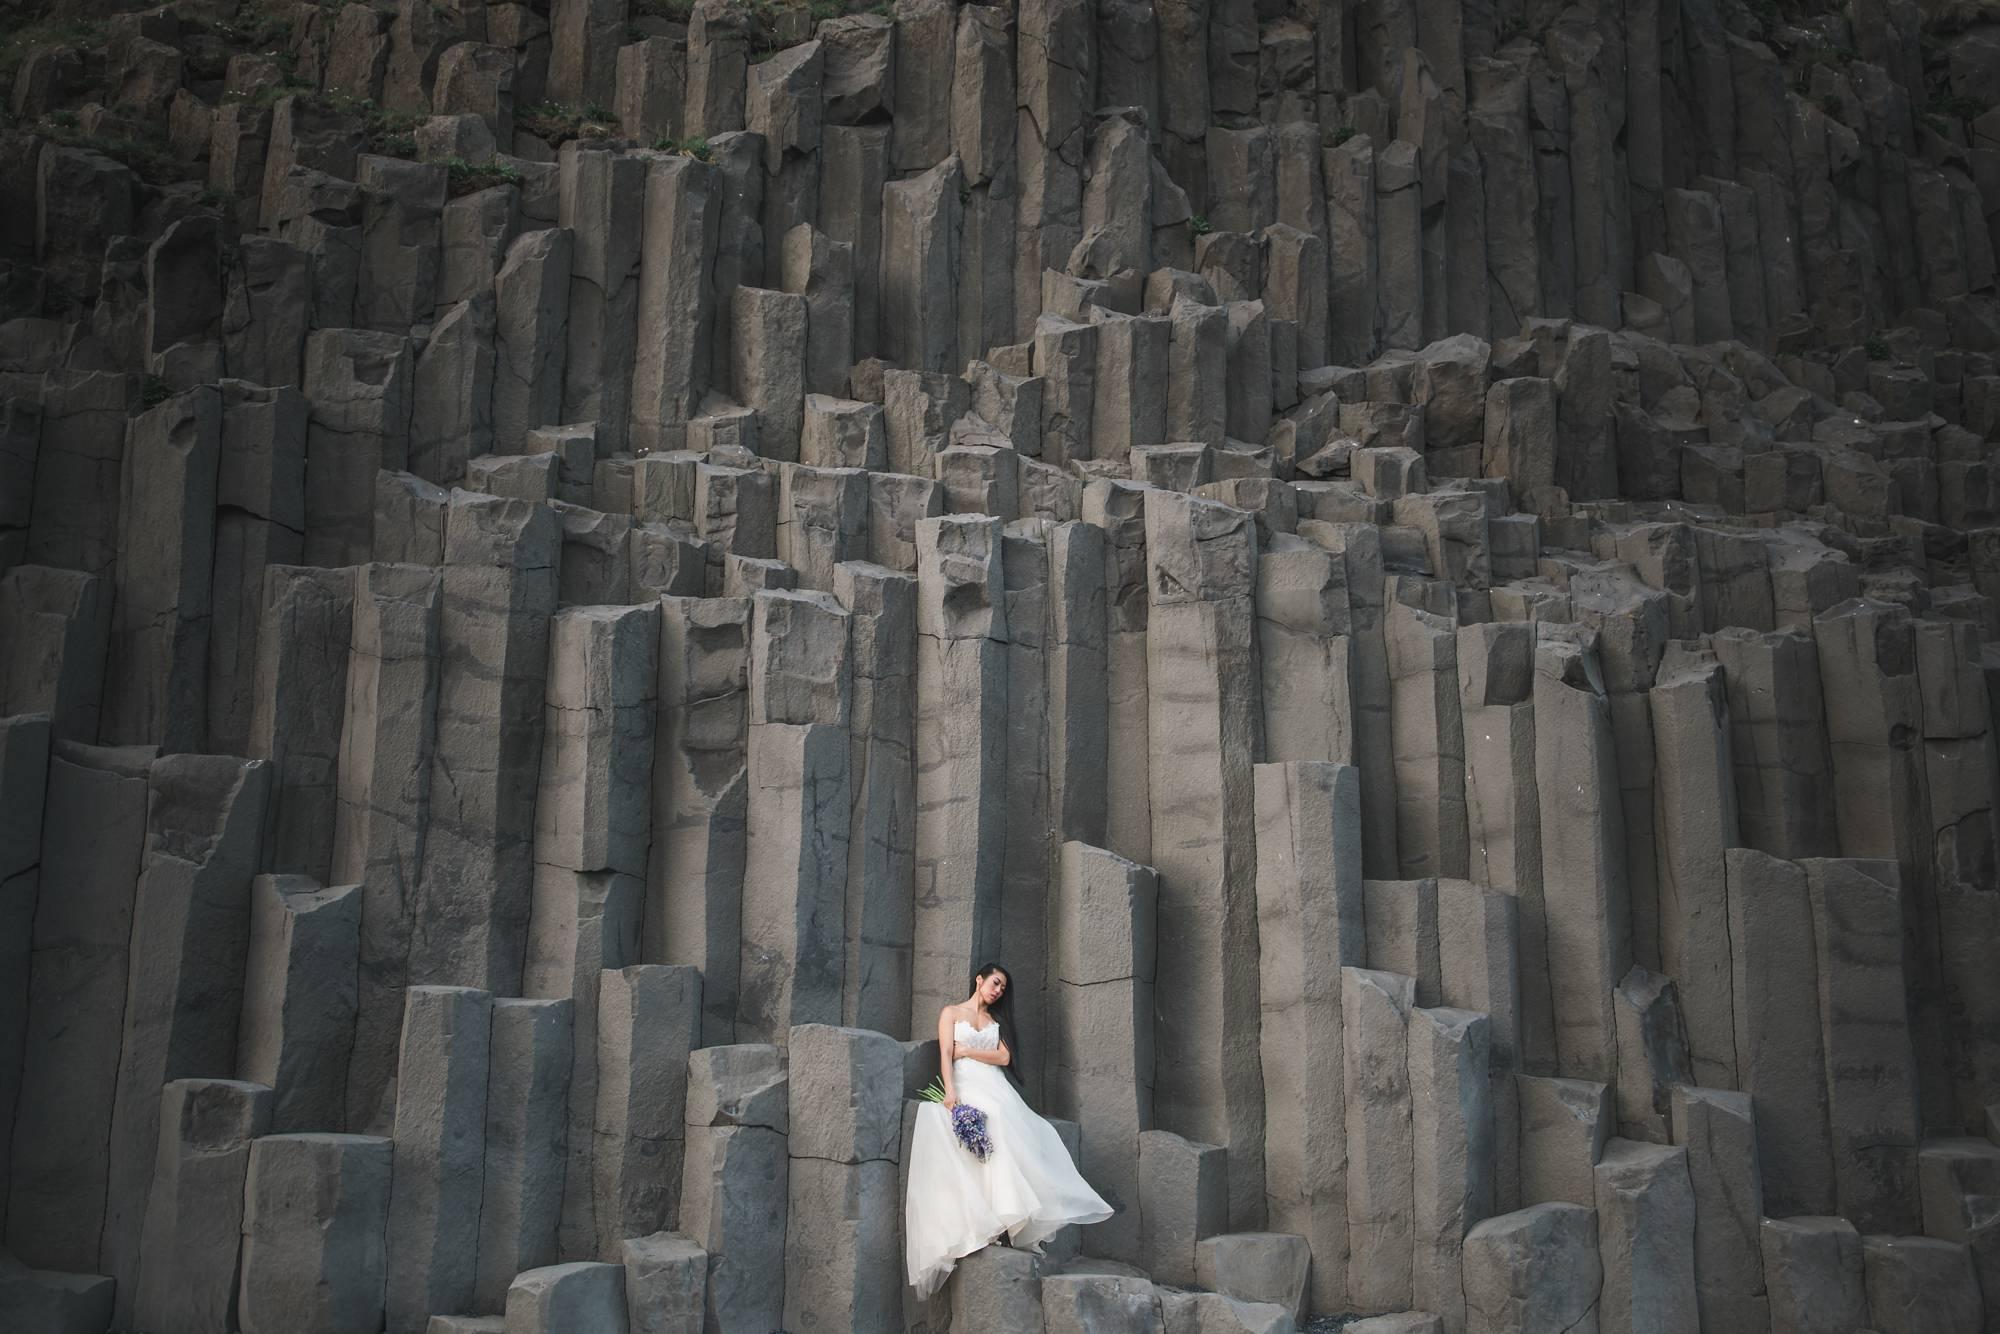 Black_Sand_Beach_Iceland_Wedding_Photos_Destination_Wedding_Photographer